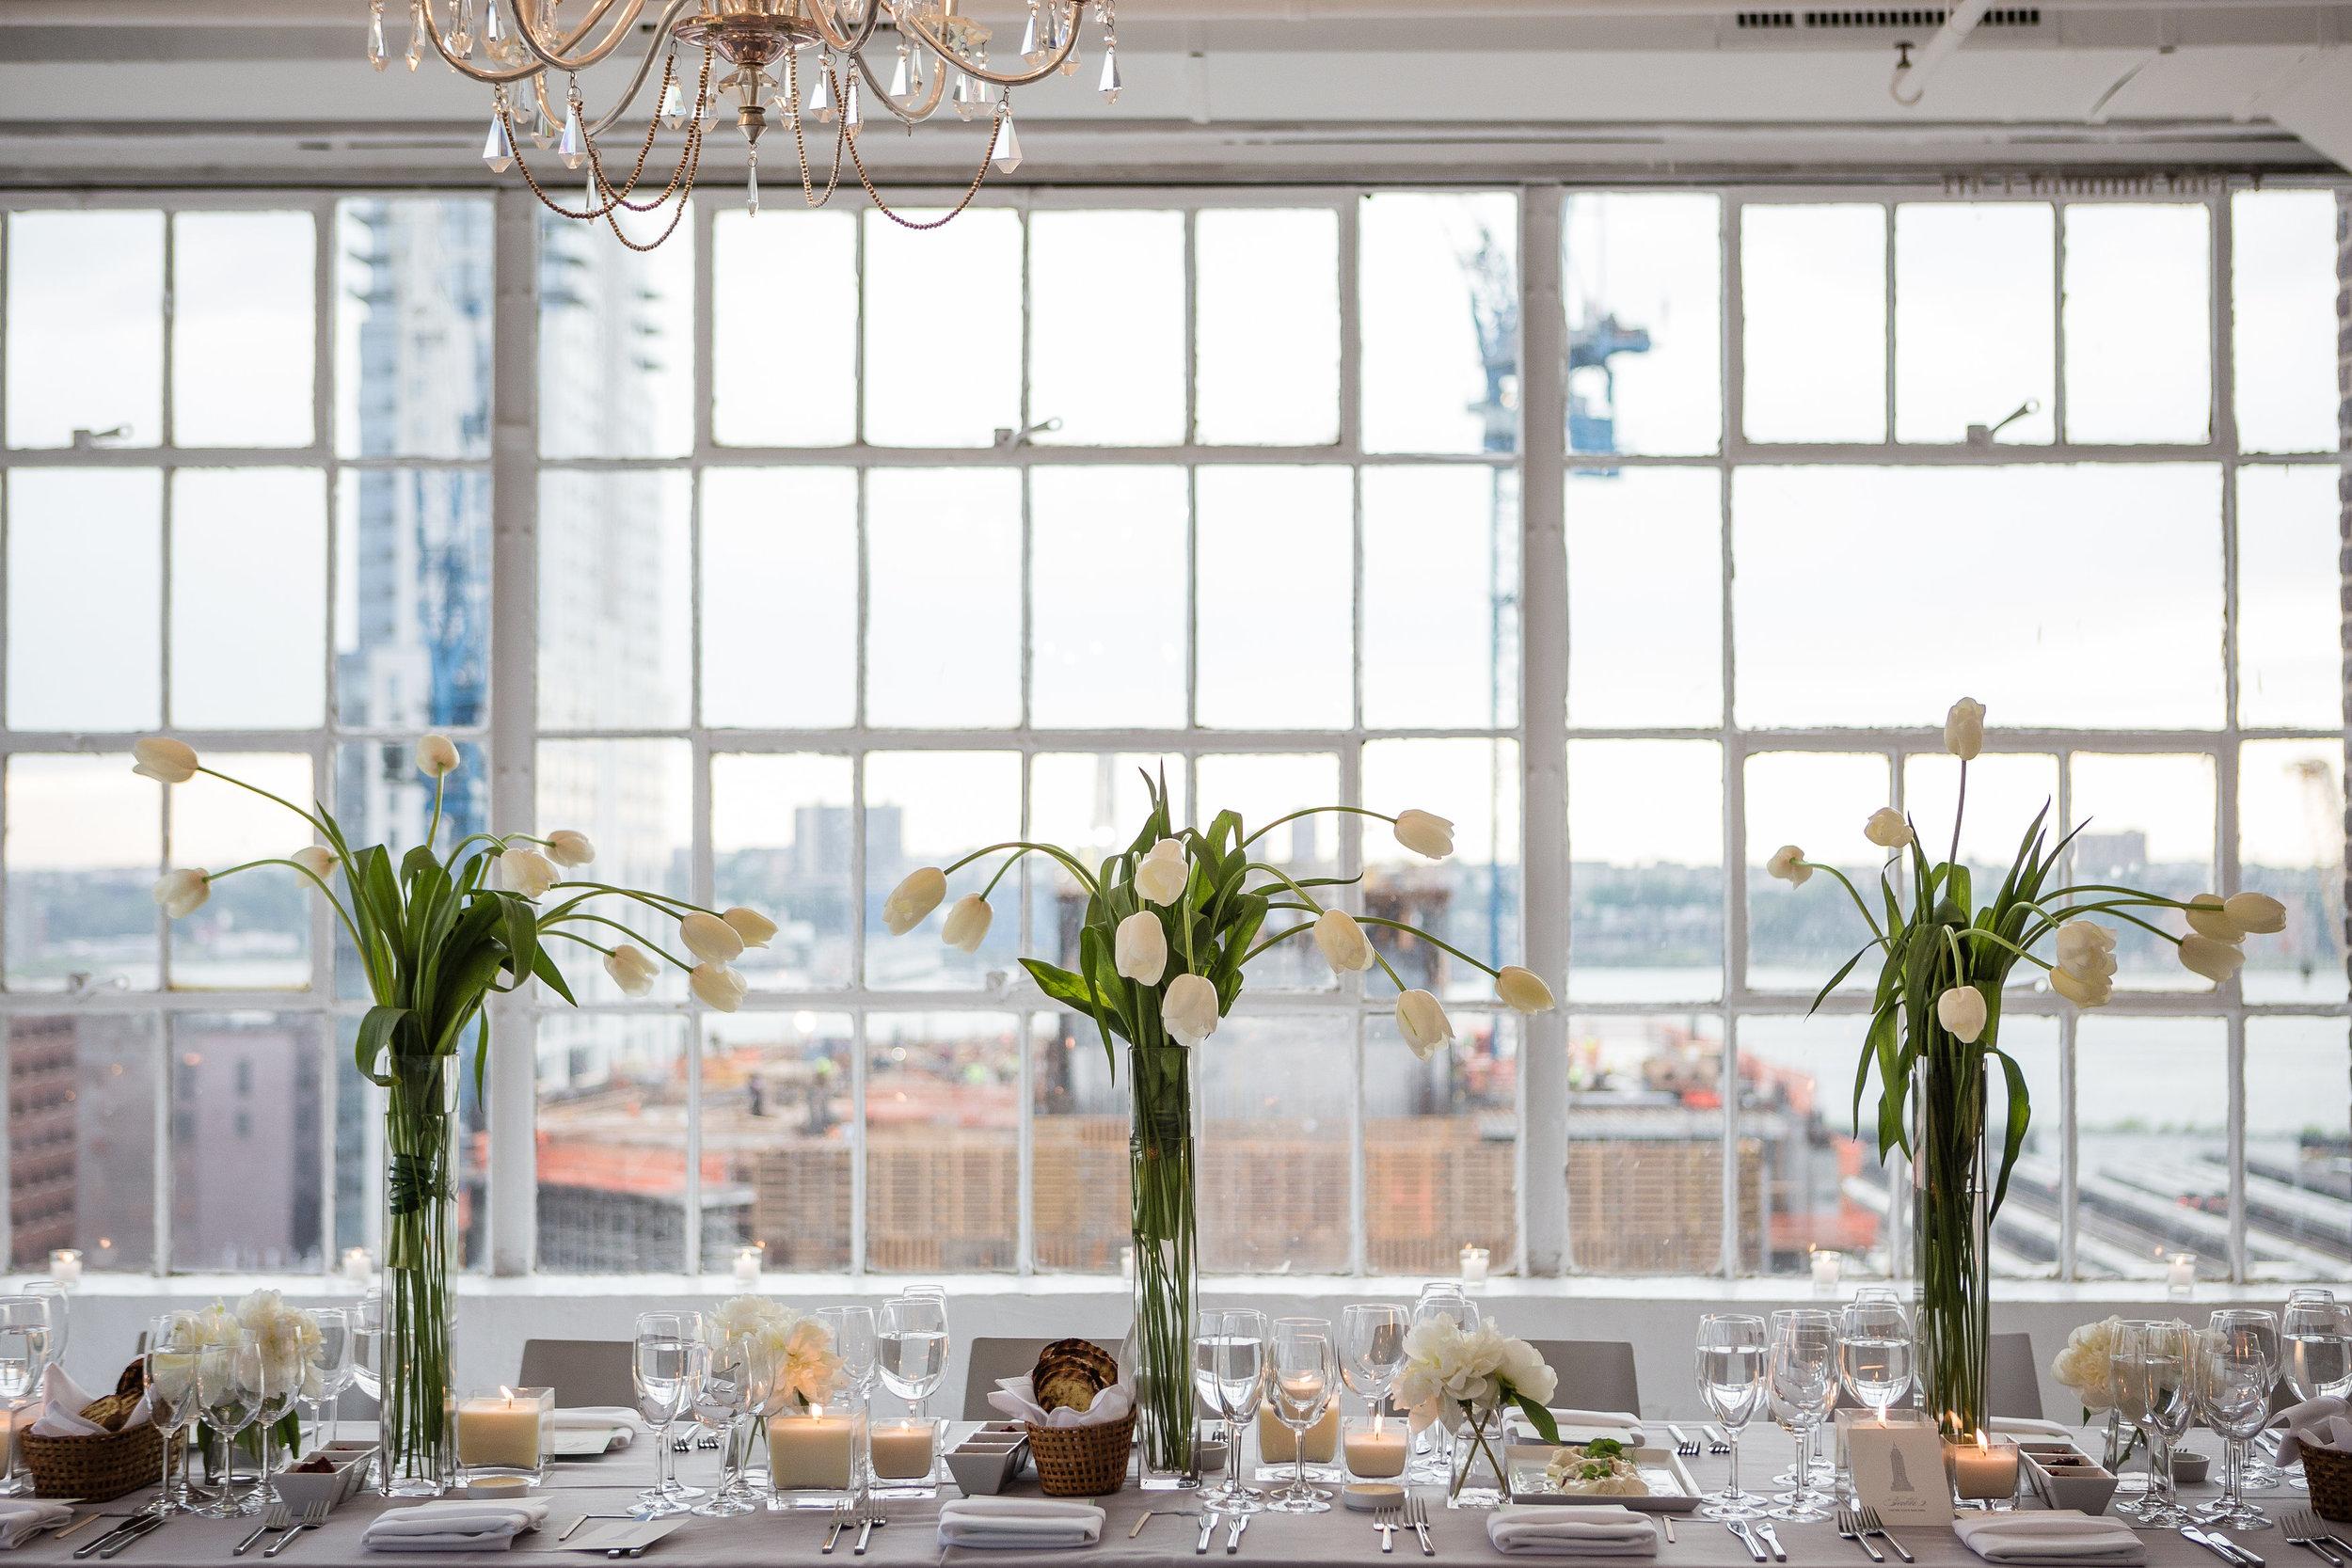 Modern Studio 450 wedding